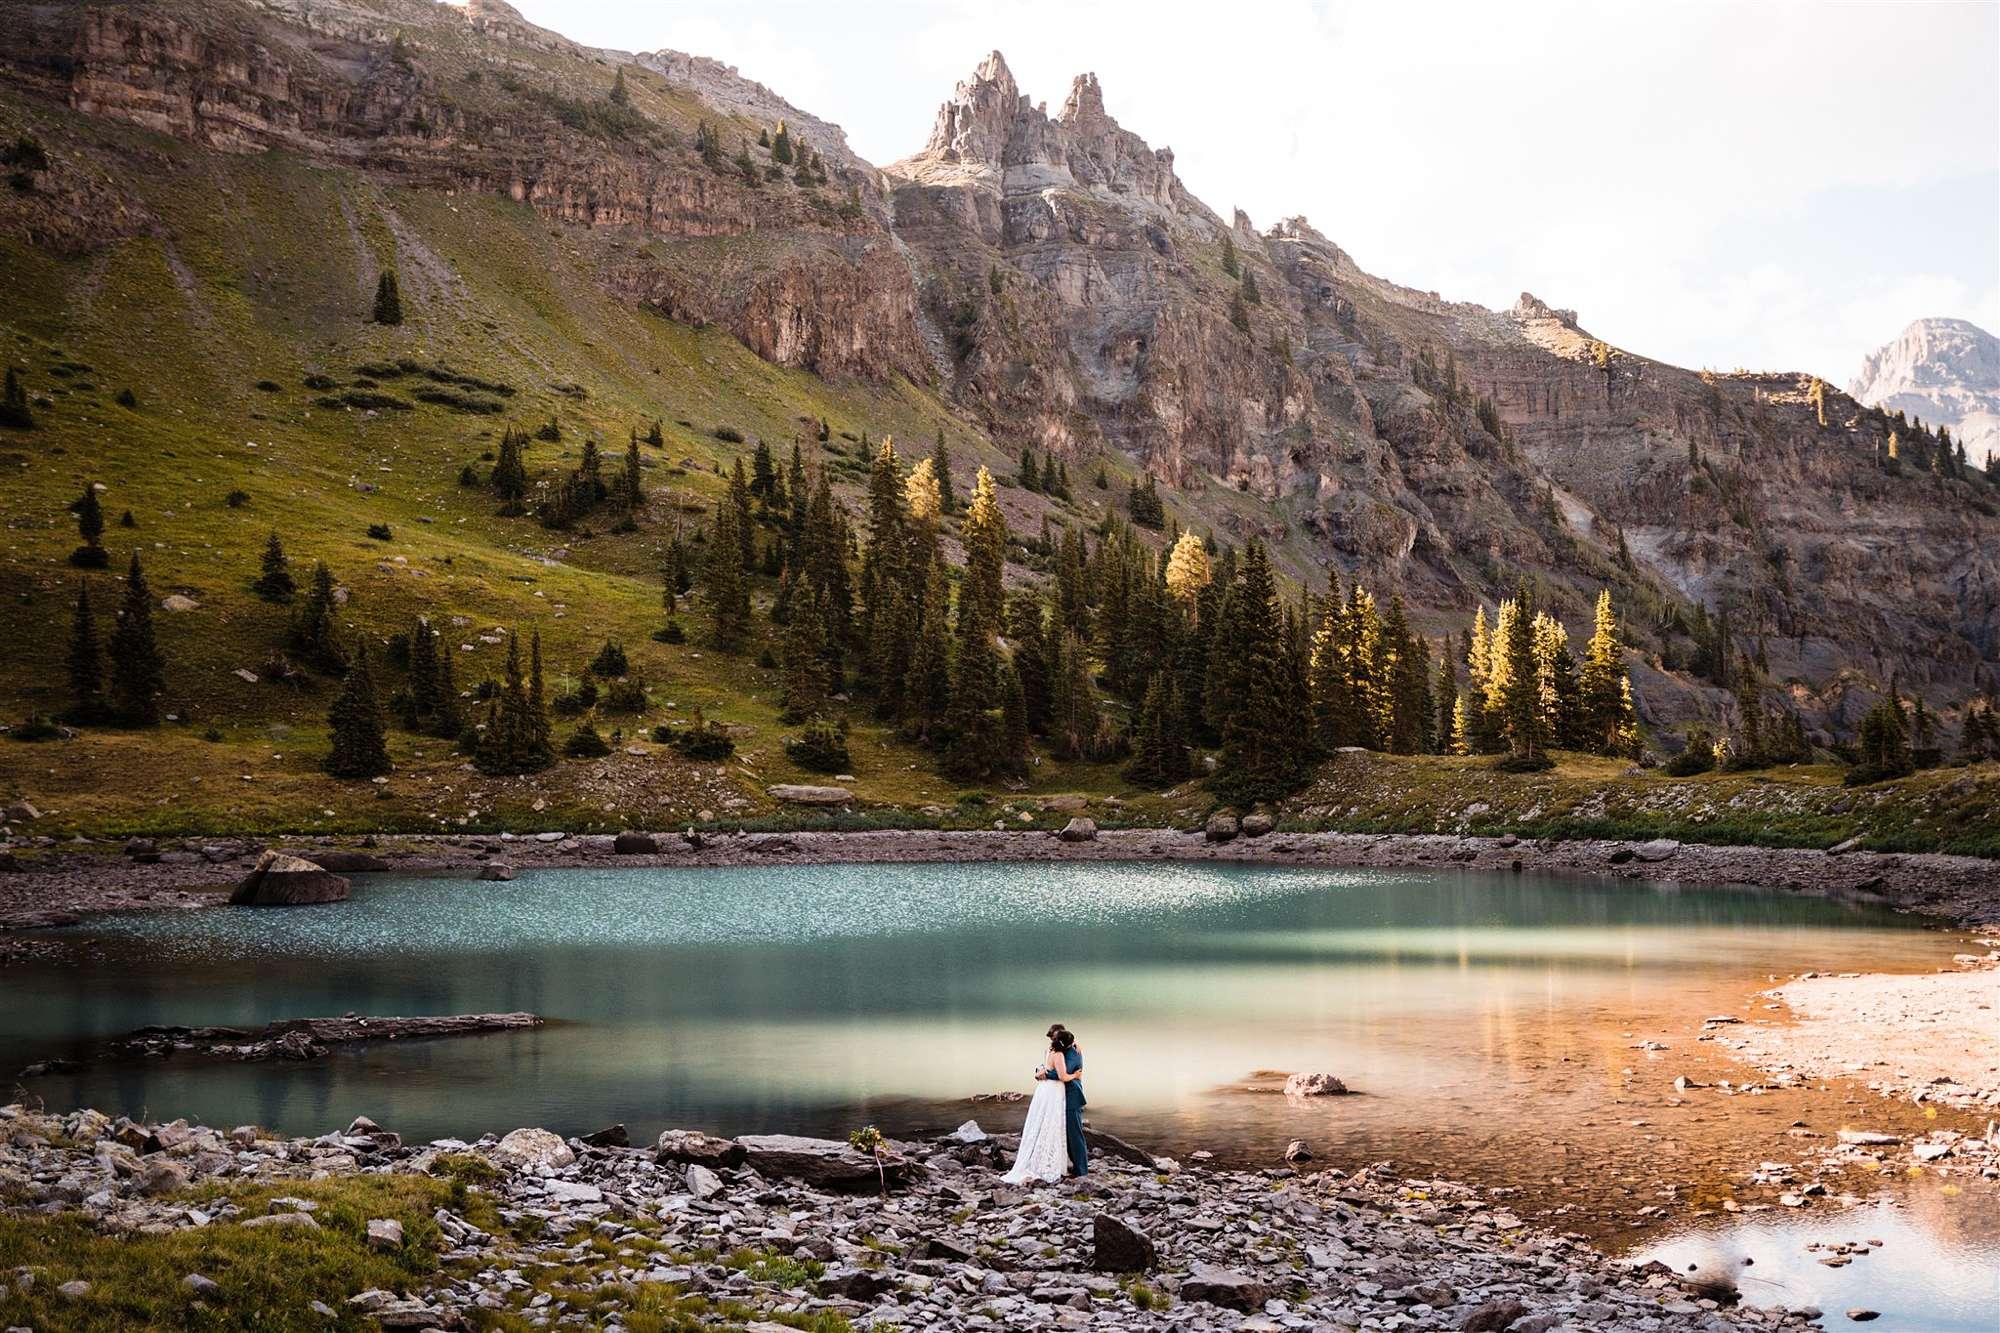 Colorado_Jeeping_Elopement_Emily_Matt_The_Foxes_Photography_0035.jpg